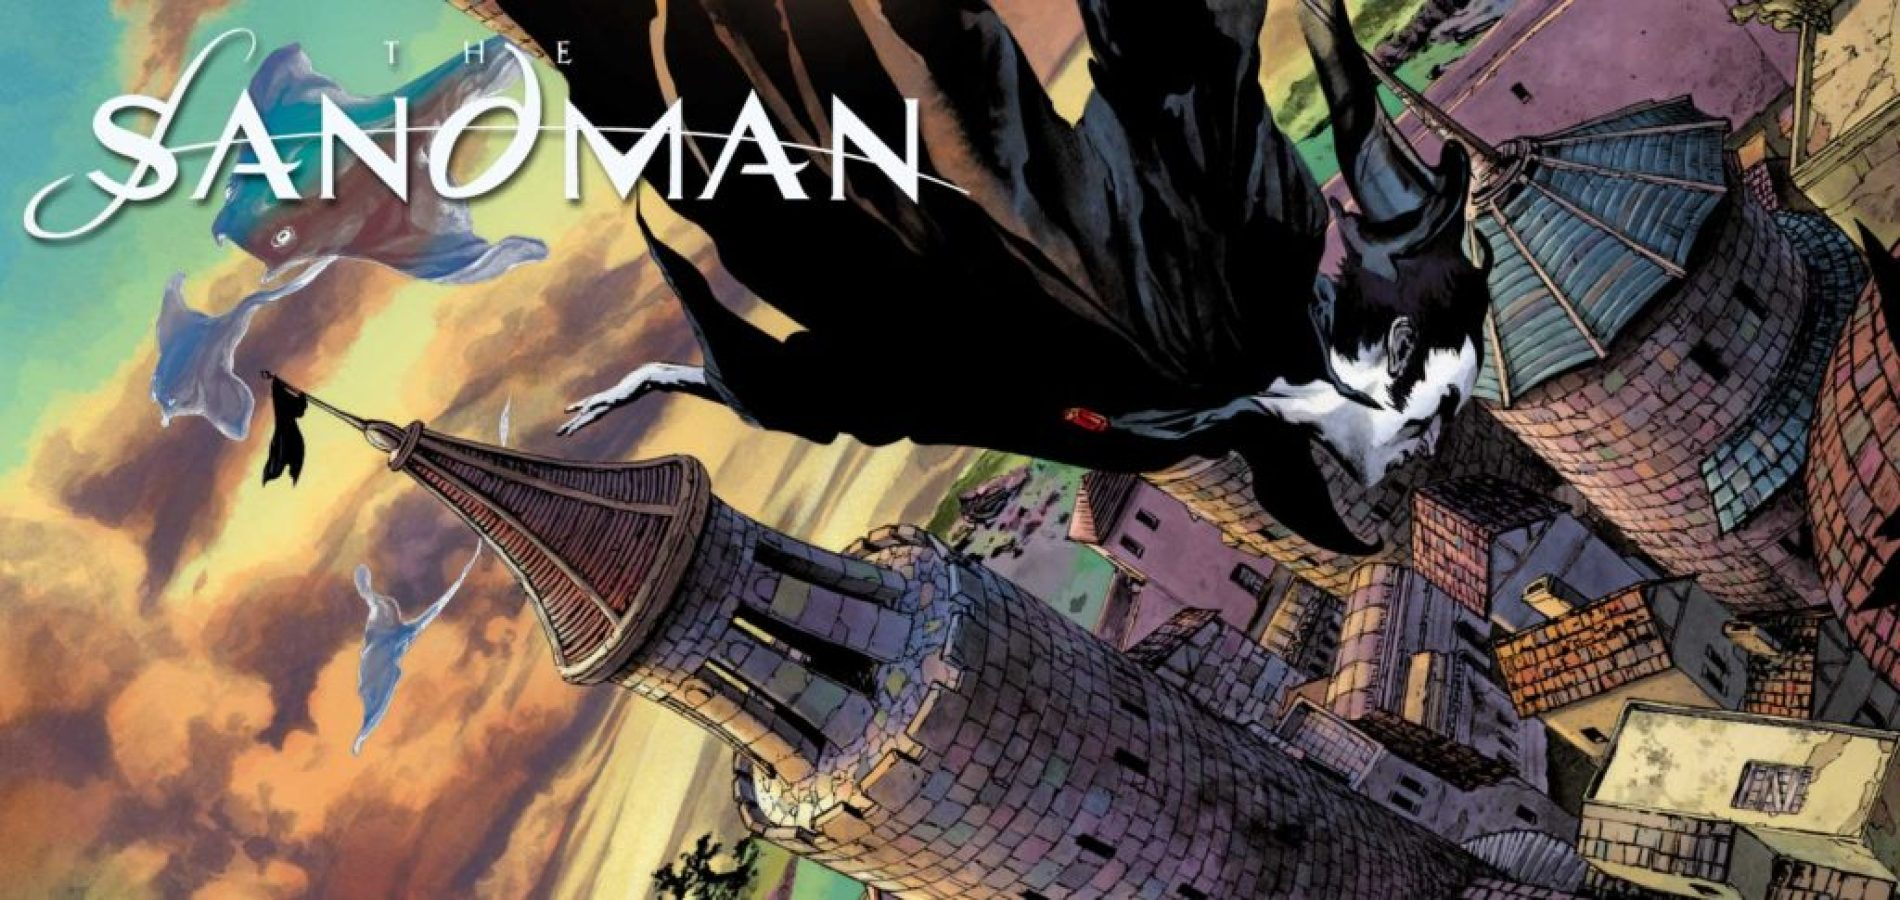 Neil Gaiman's Sandman from Vertigo Comics